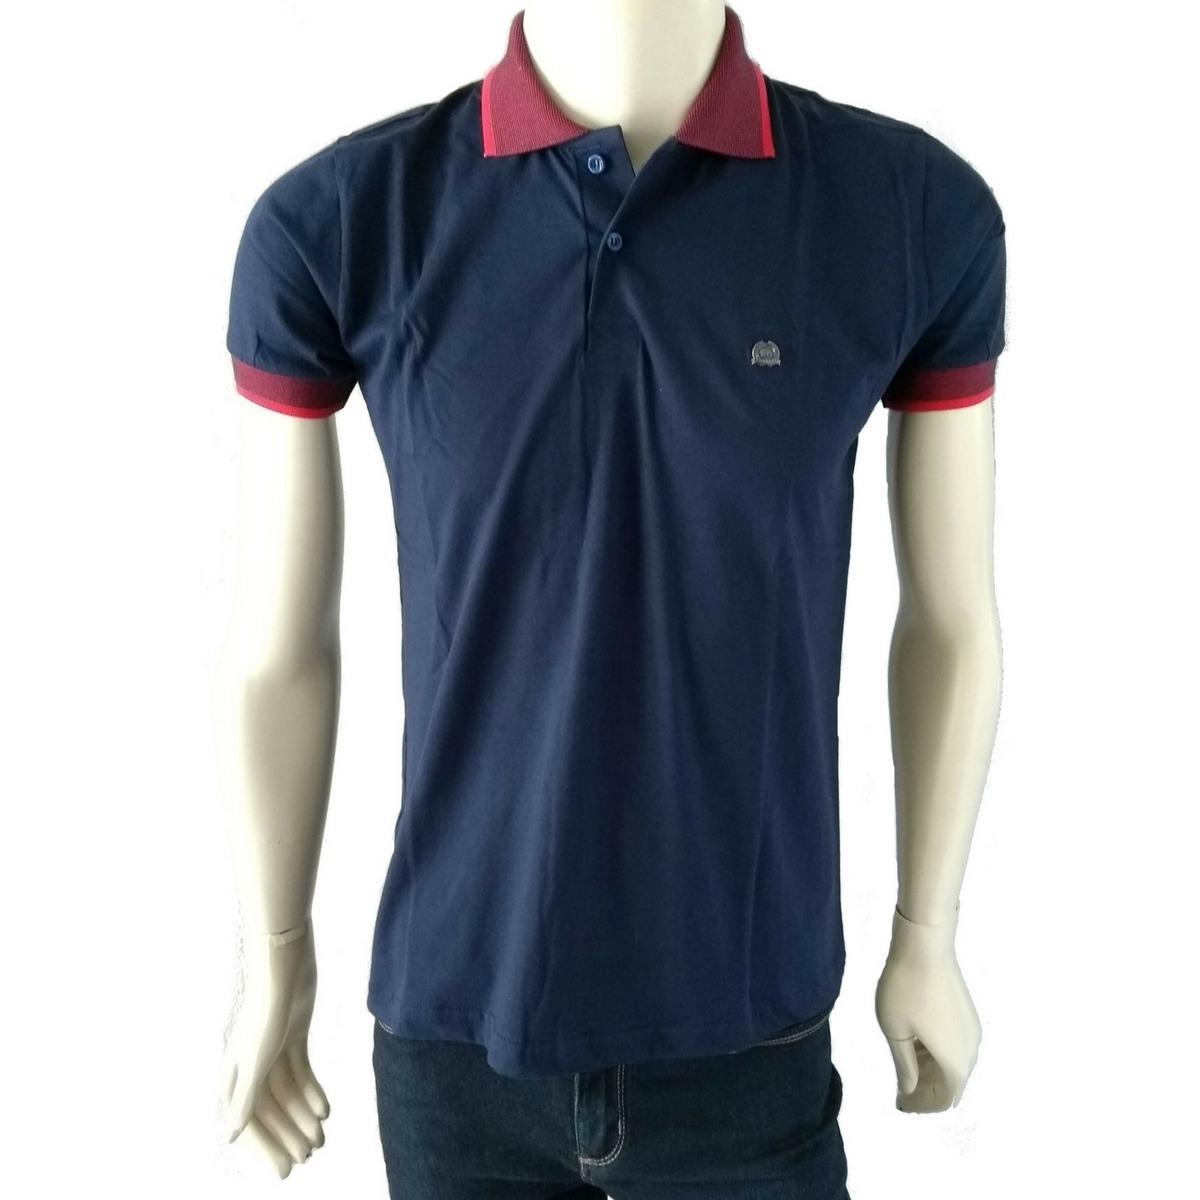 camisa polo masculina promocao oferta de fabrica liquidacao. Carregando zoom . 16912f14ad1c4